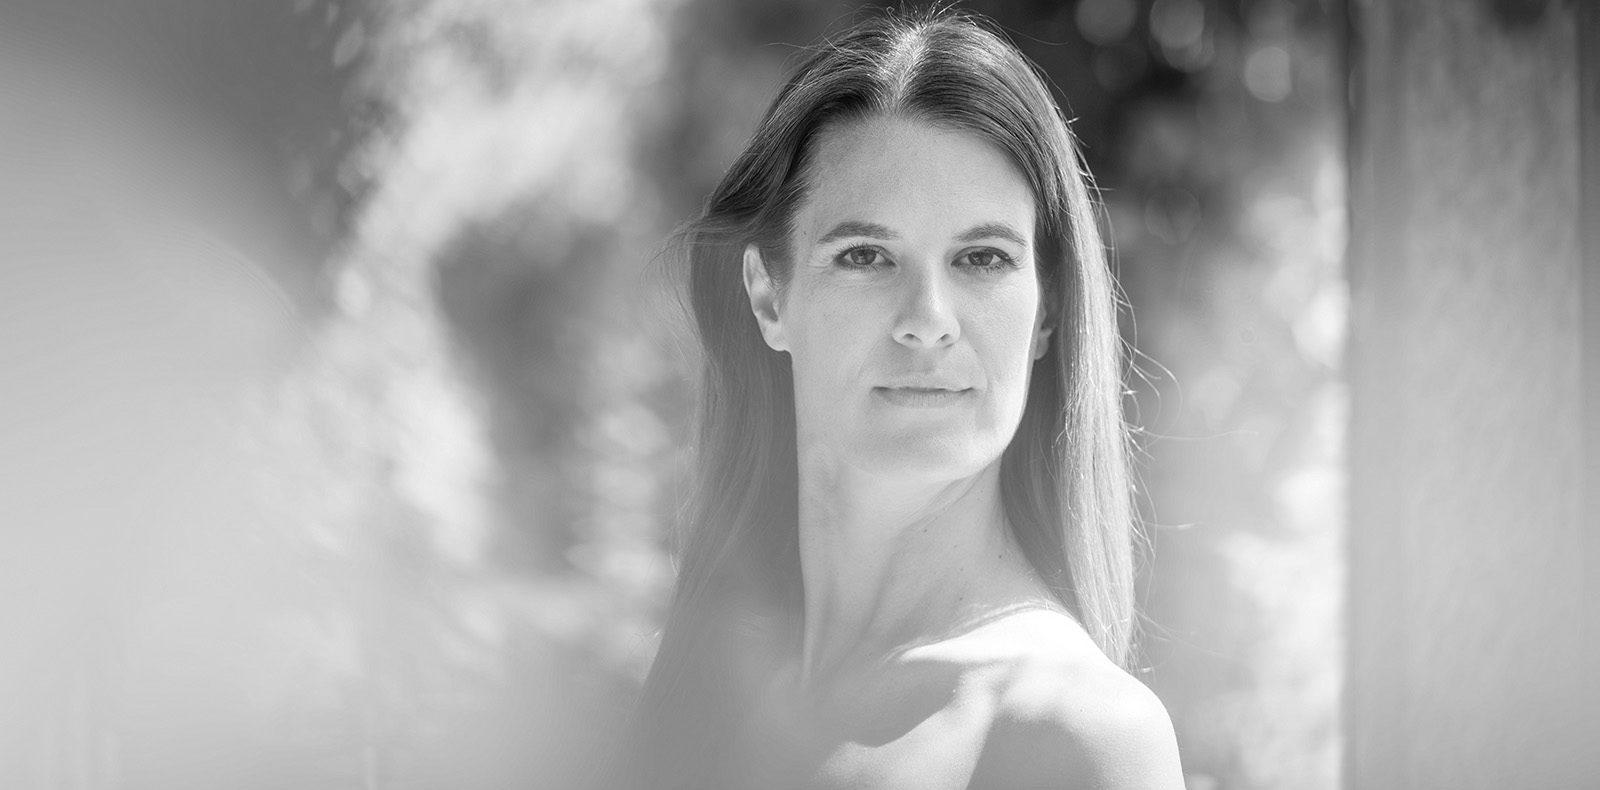 Andrea Wiesli